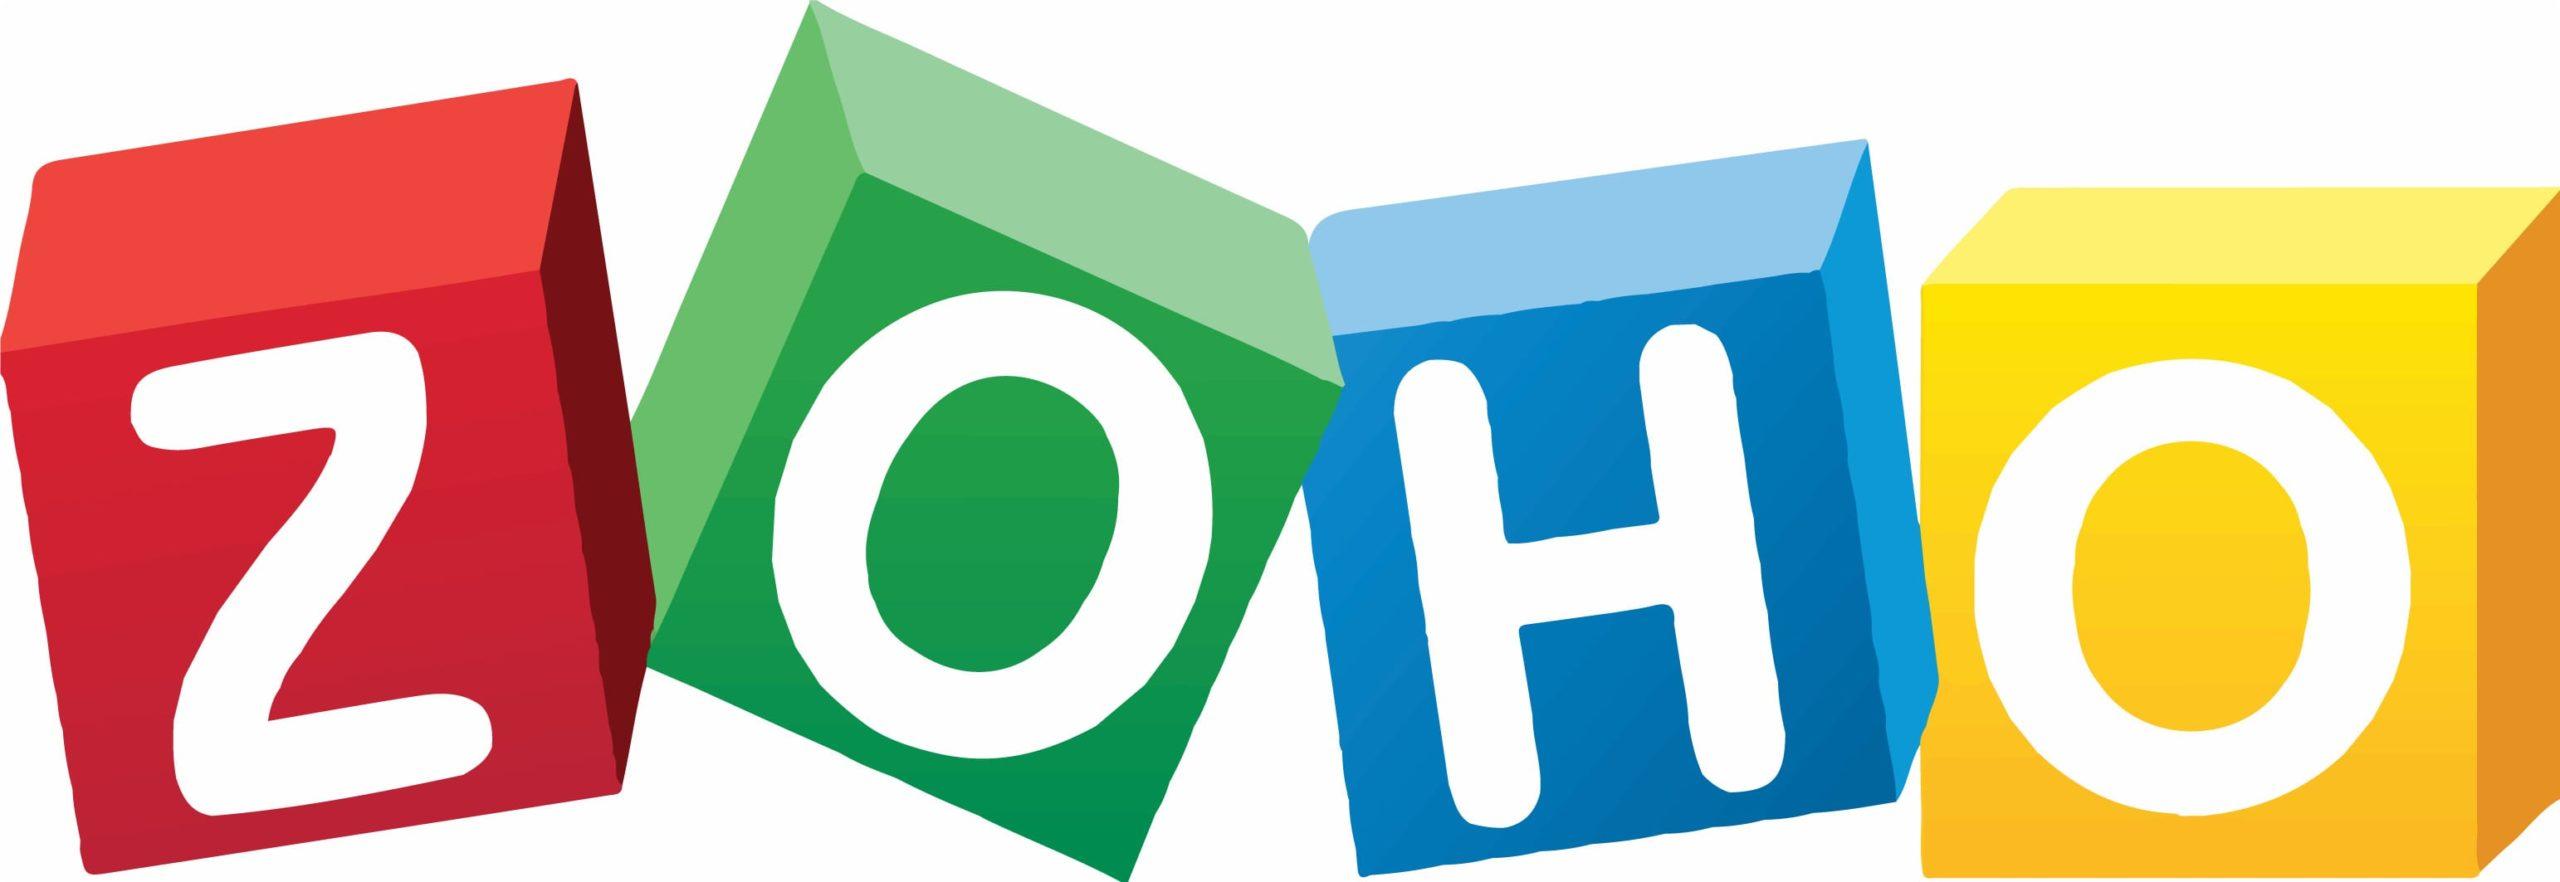 5Augustzoho-logo-iloveimg-converted-min